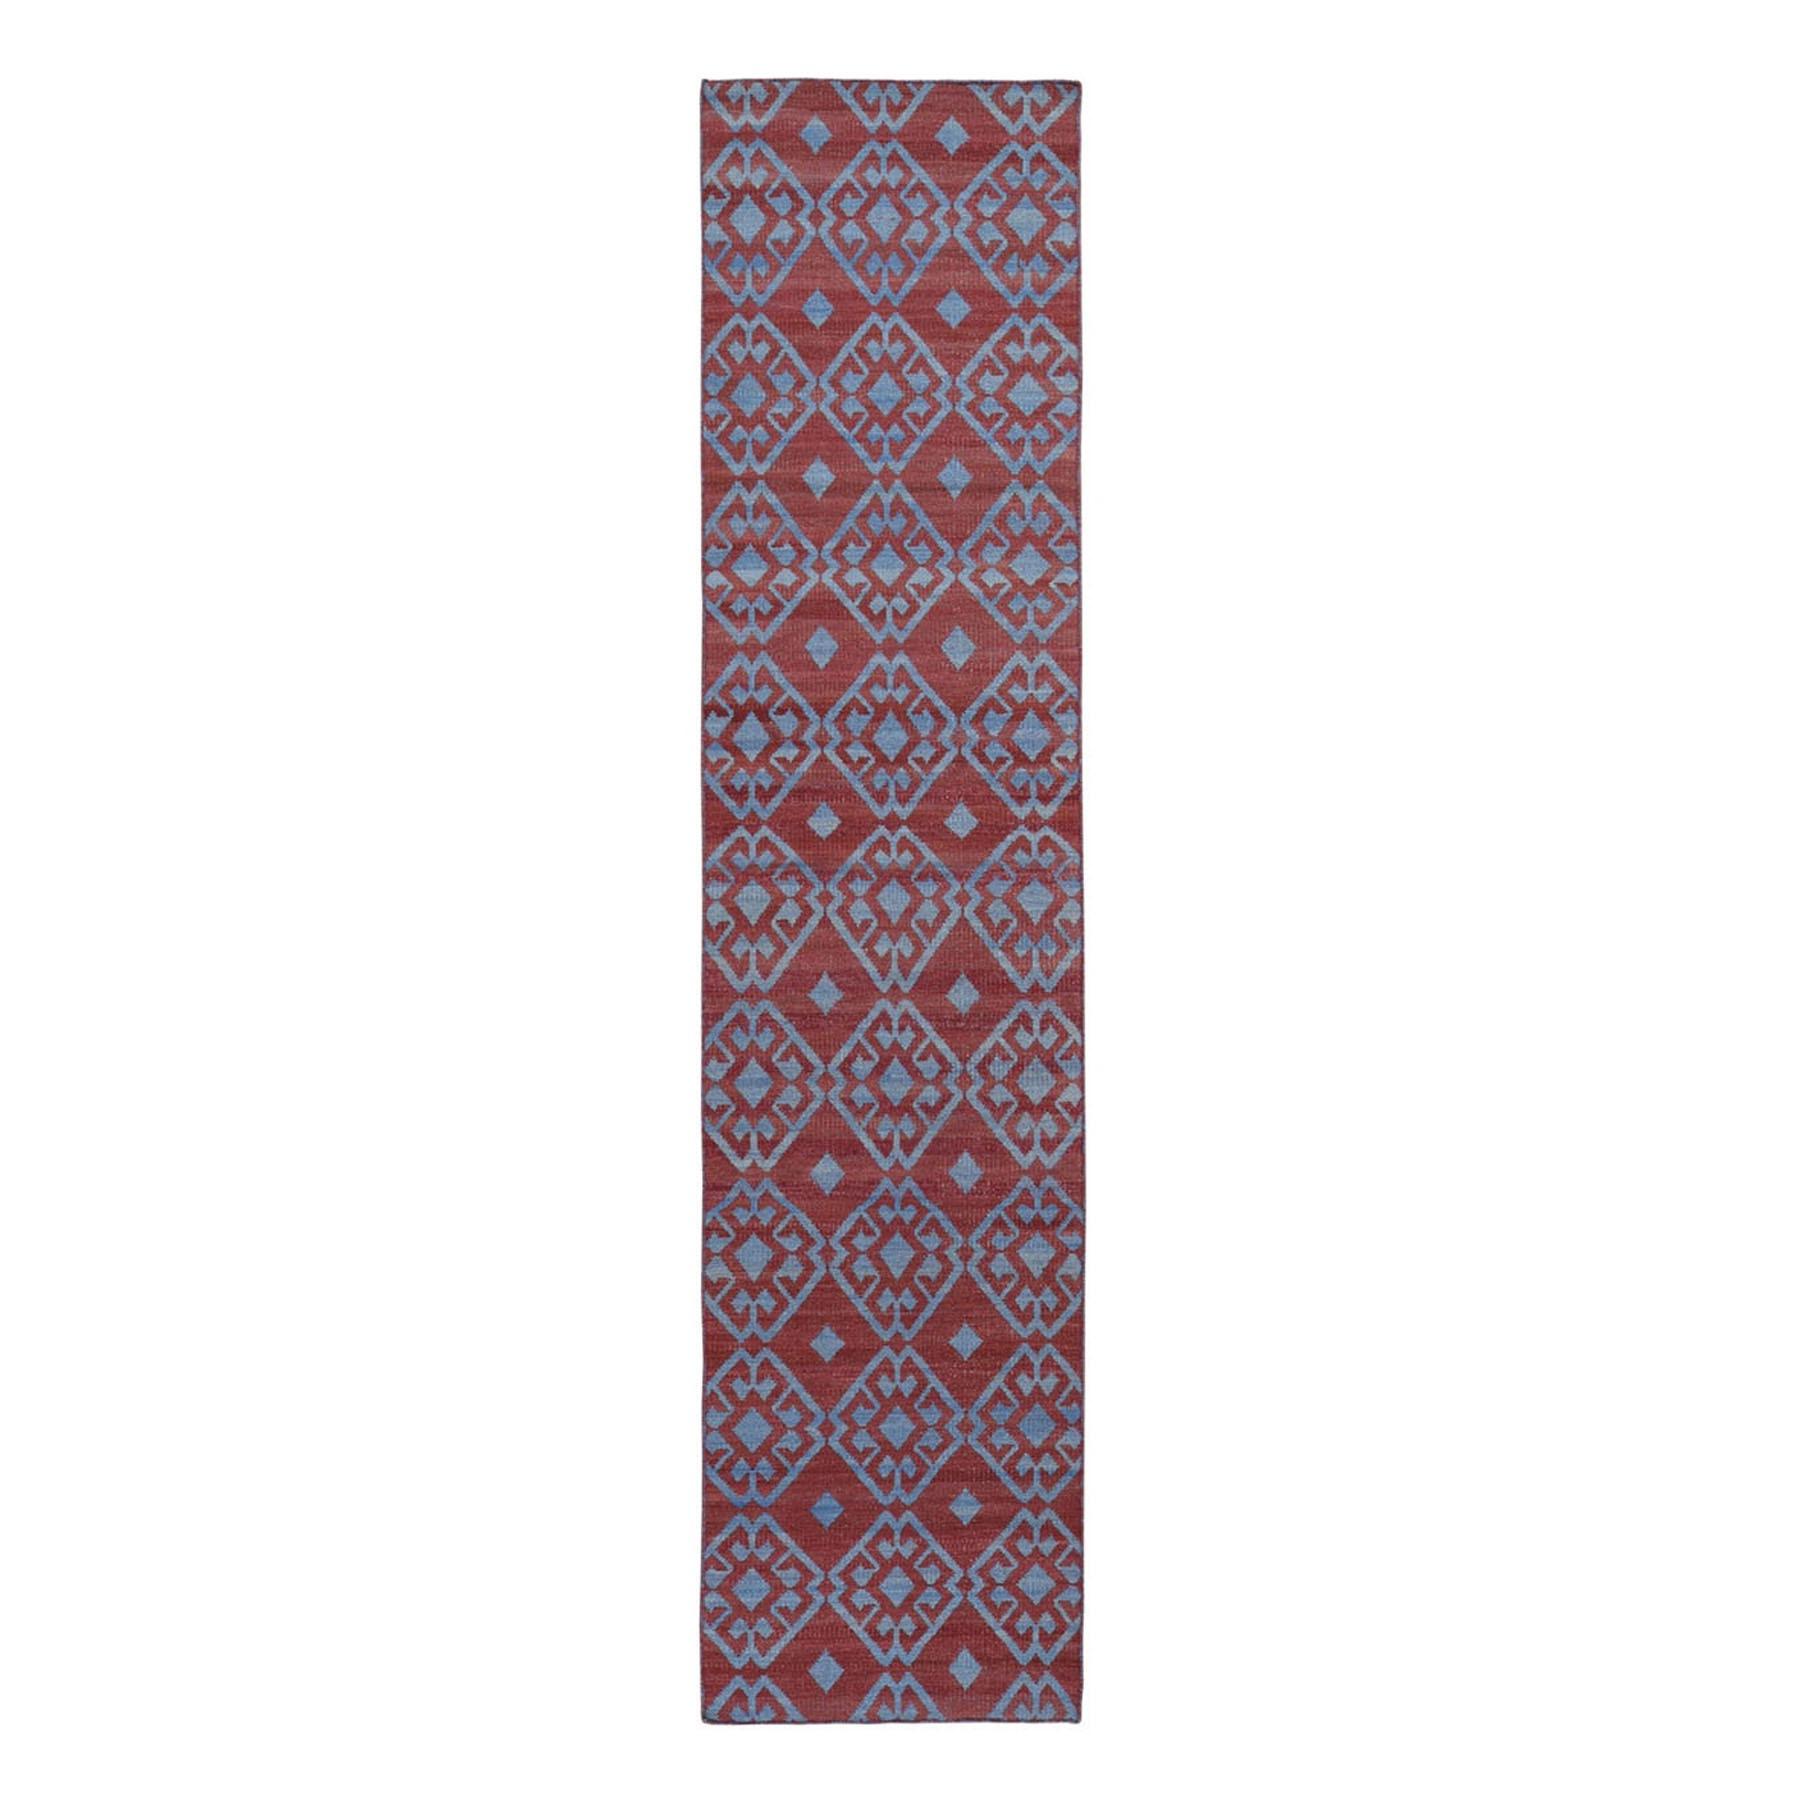 "2'6""x11'8"" Hand Woven Flat Weave Pure Wool Reversible Kilim Runner Oriental Rug"